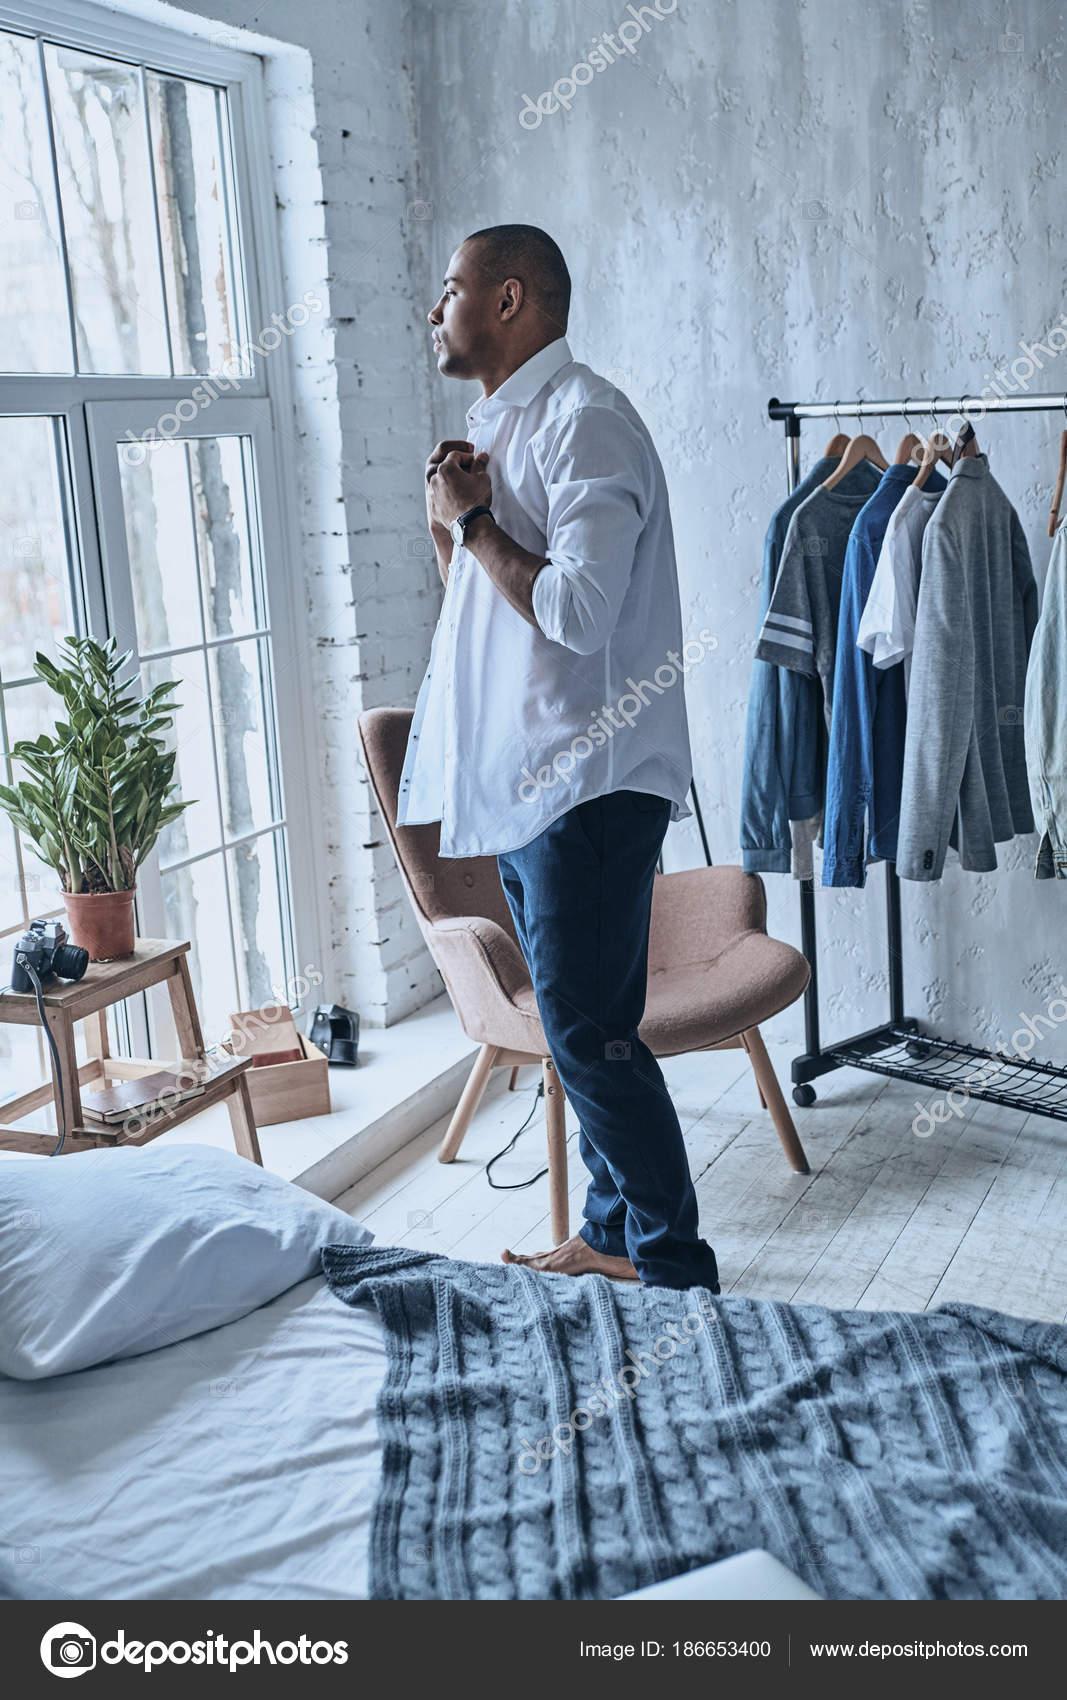 c45eb1dd5 Homem Bonito Vestir Camisola Quarto Casa — Fotografia de Stock